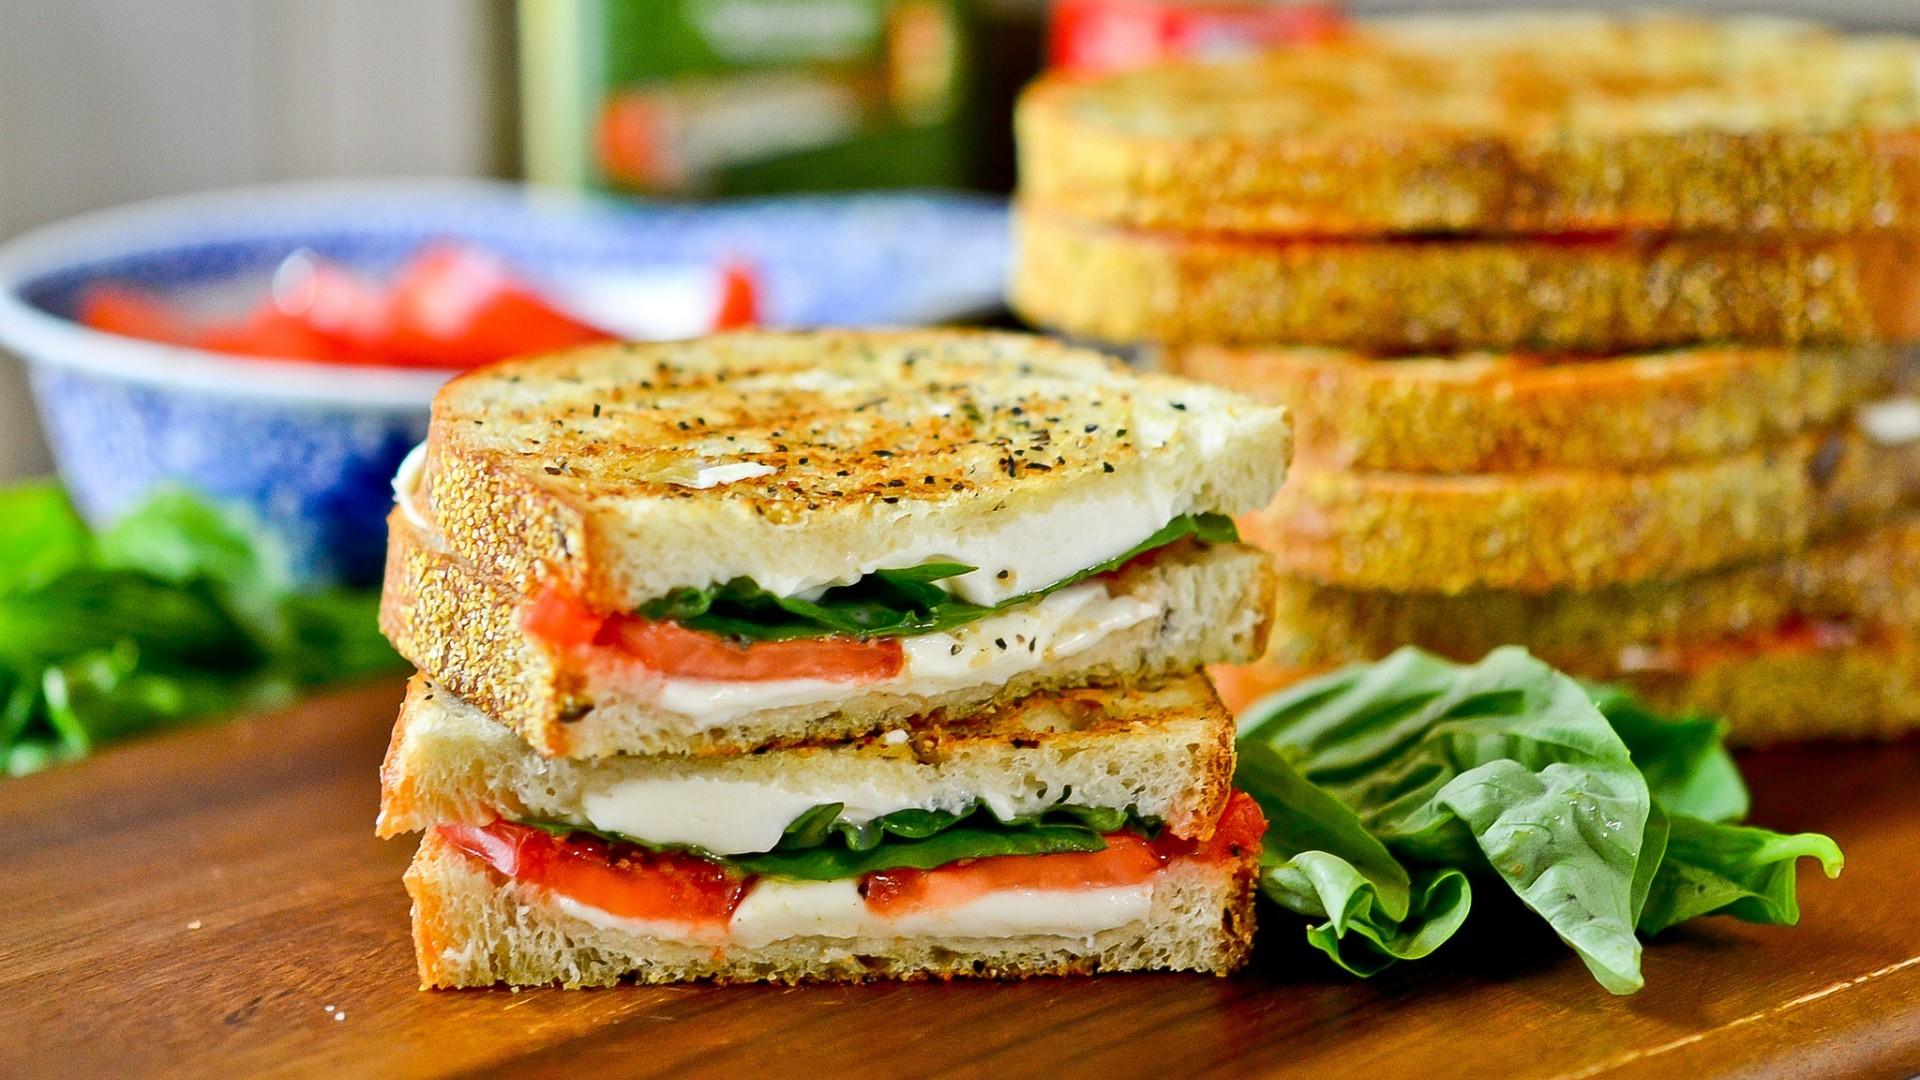 Wallpaper Blurred Breakfast Sandwiches Meal Cuisine Dish Produce Vegetable Vegetarian Food Veggie Burger Blt Ham And Cheese Sandwich 1920x1080 Izmirli 177109 Hd Wallpapers Wallhere